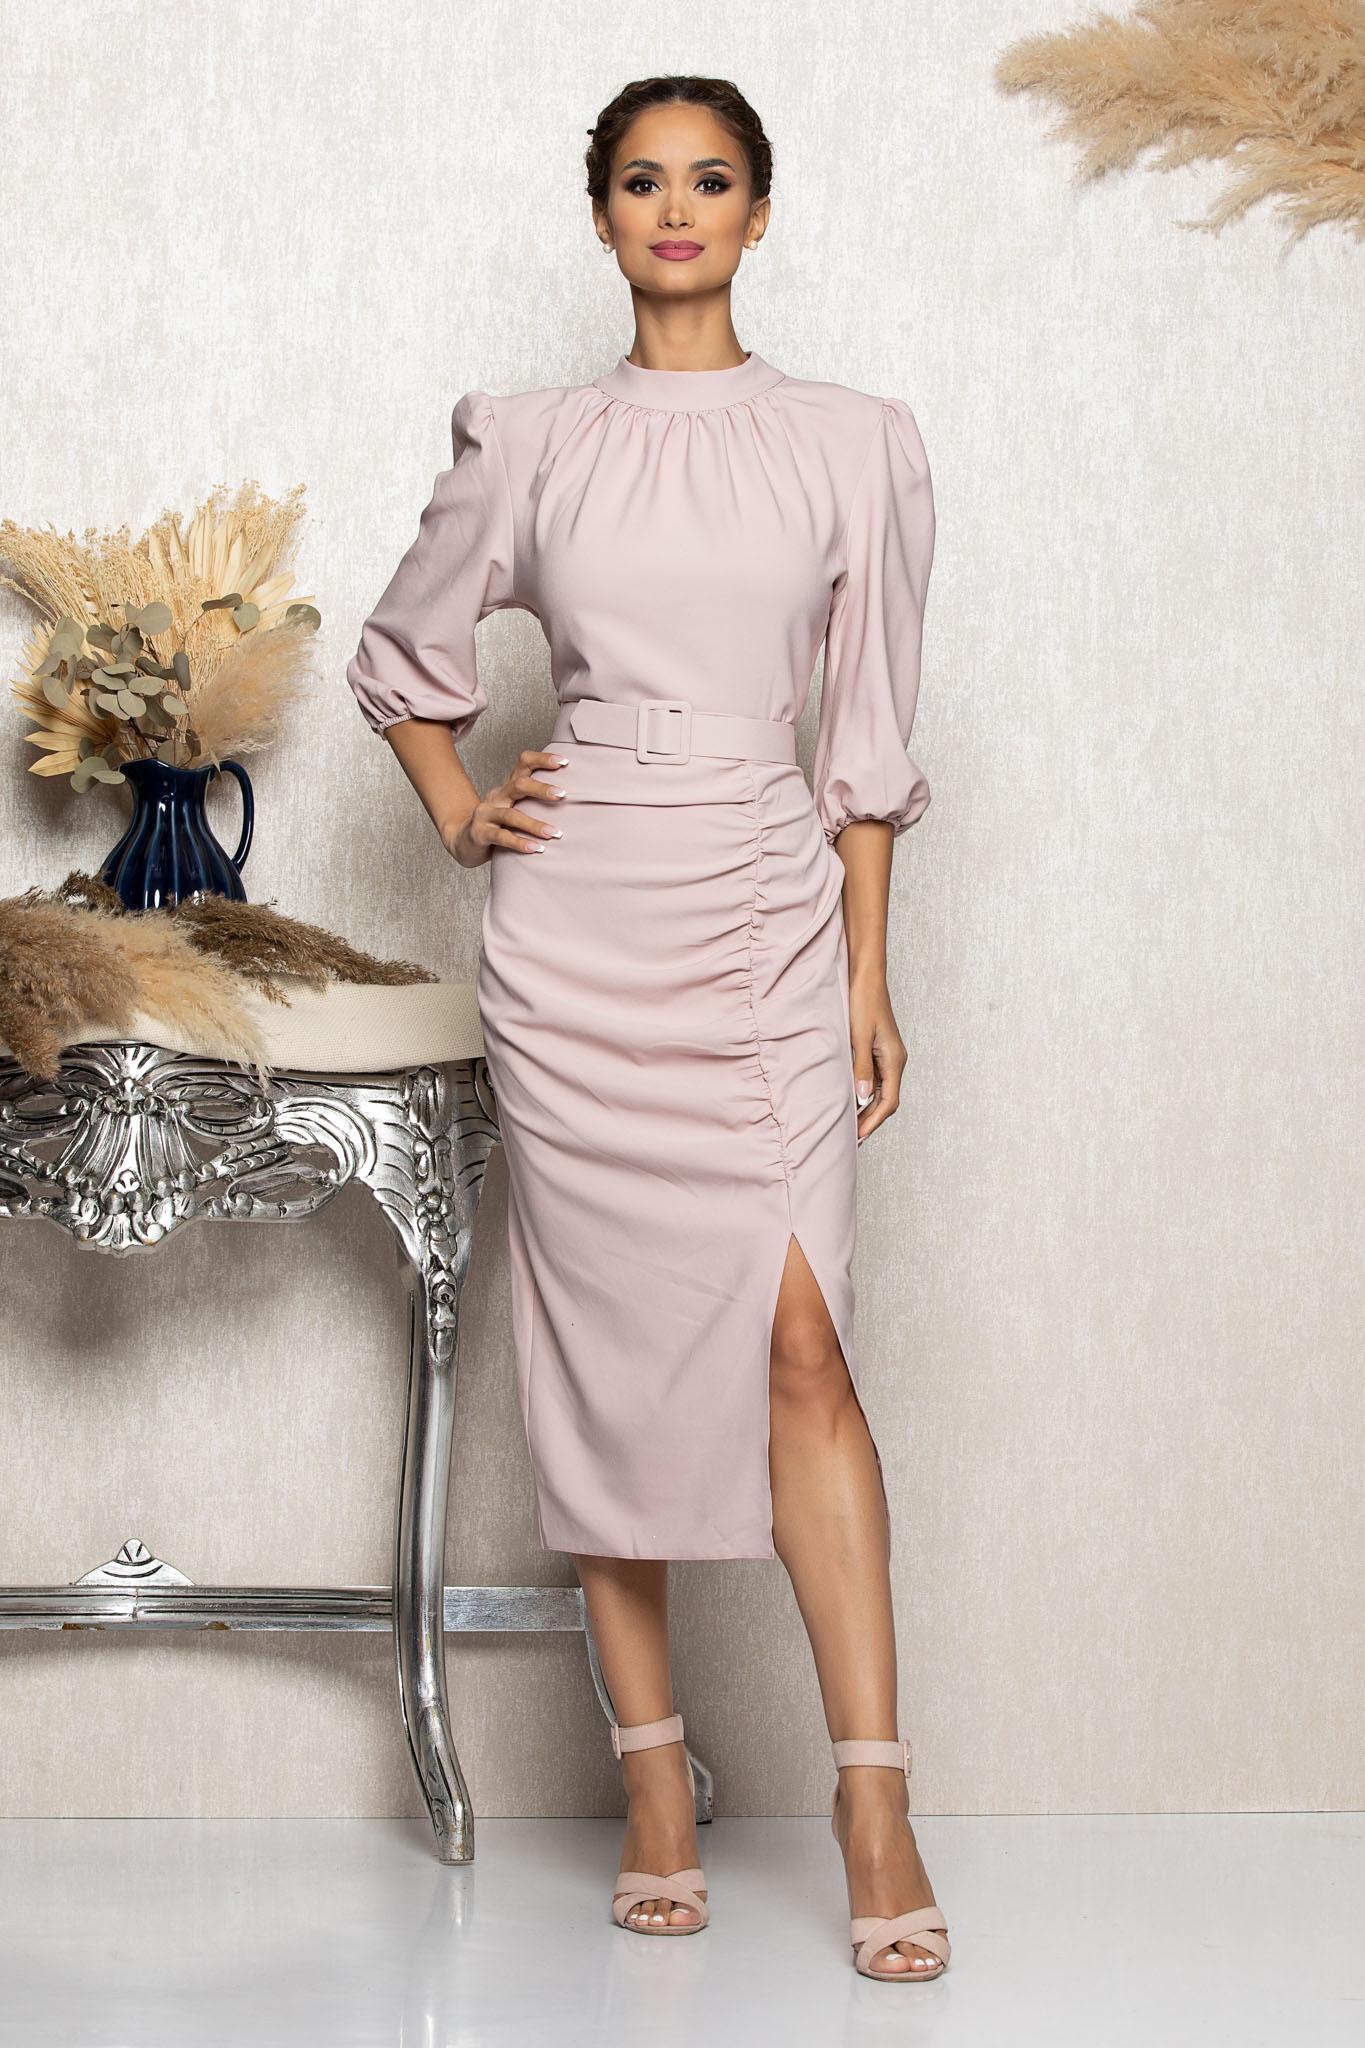 Rochie Fiorella Rose Marimi Mari XL (42)   XXL (44)   3XL (46)